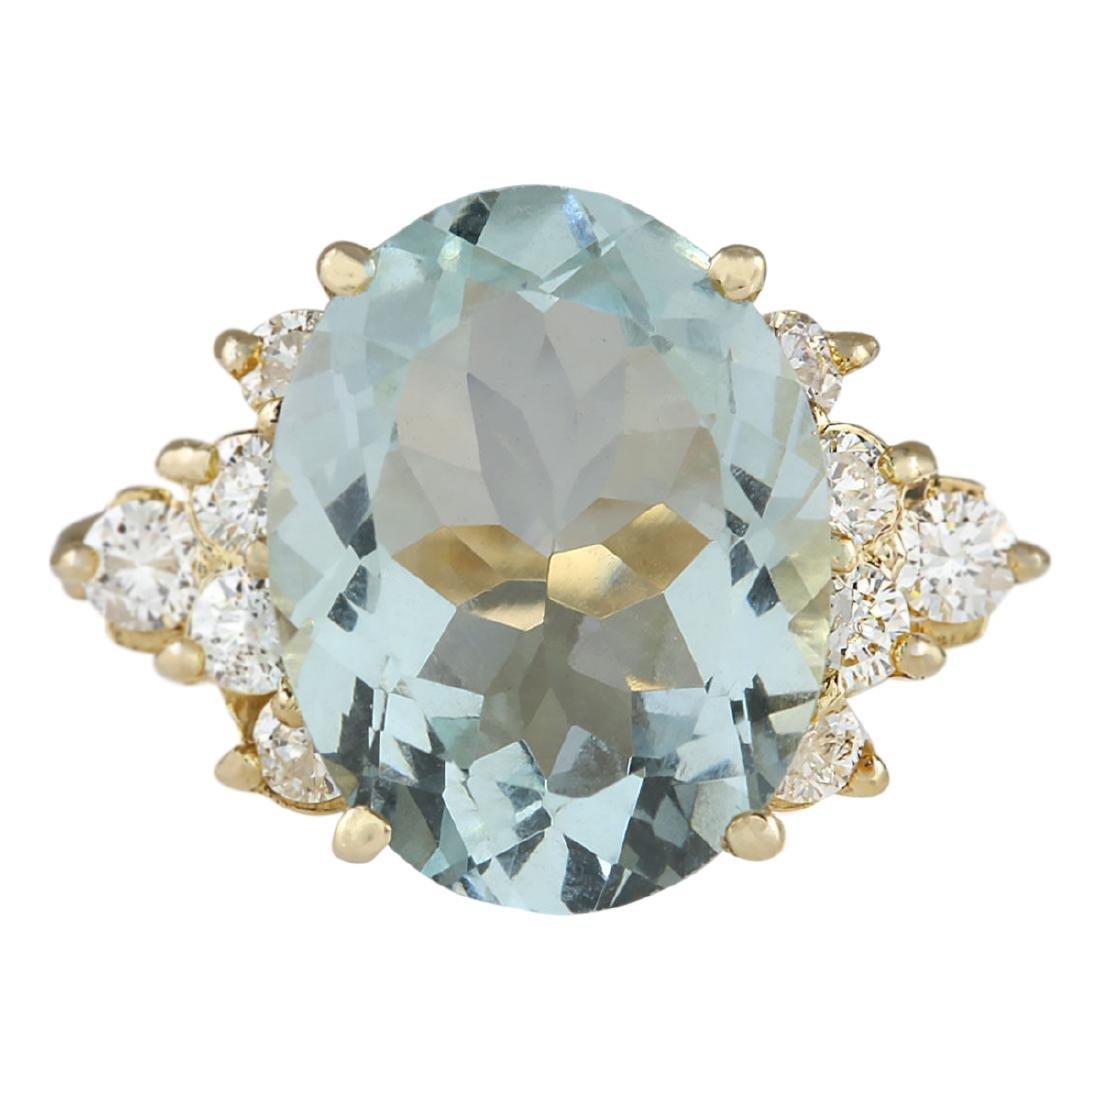 4.75 CTW Natural Aquamarine And Diamond Ring In 18K